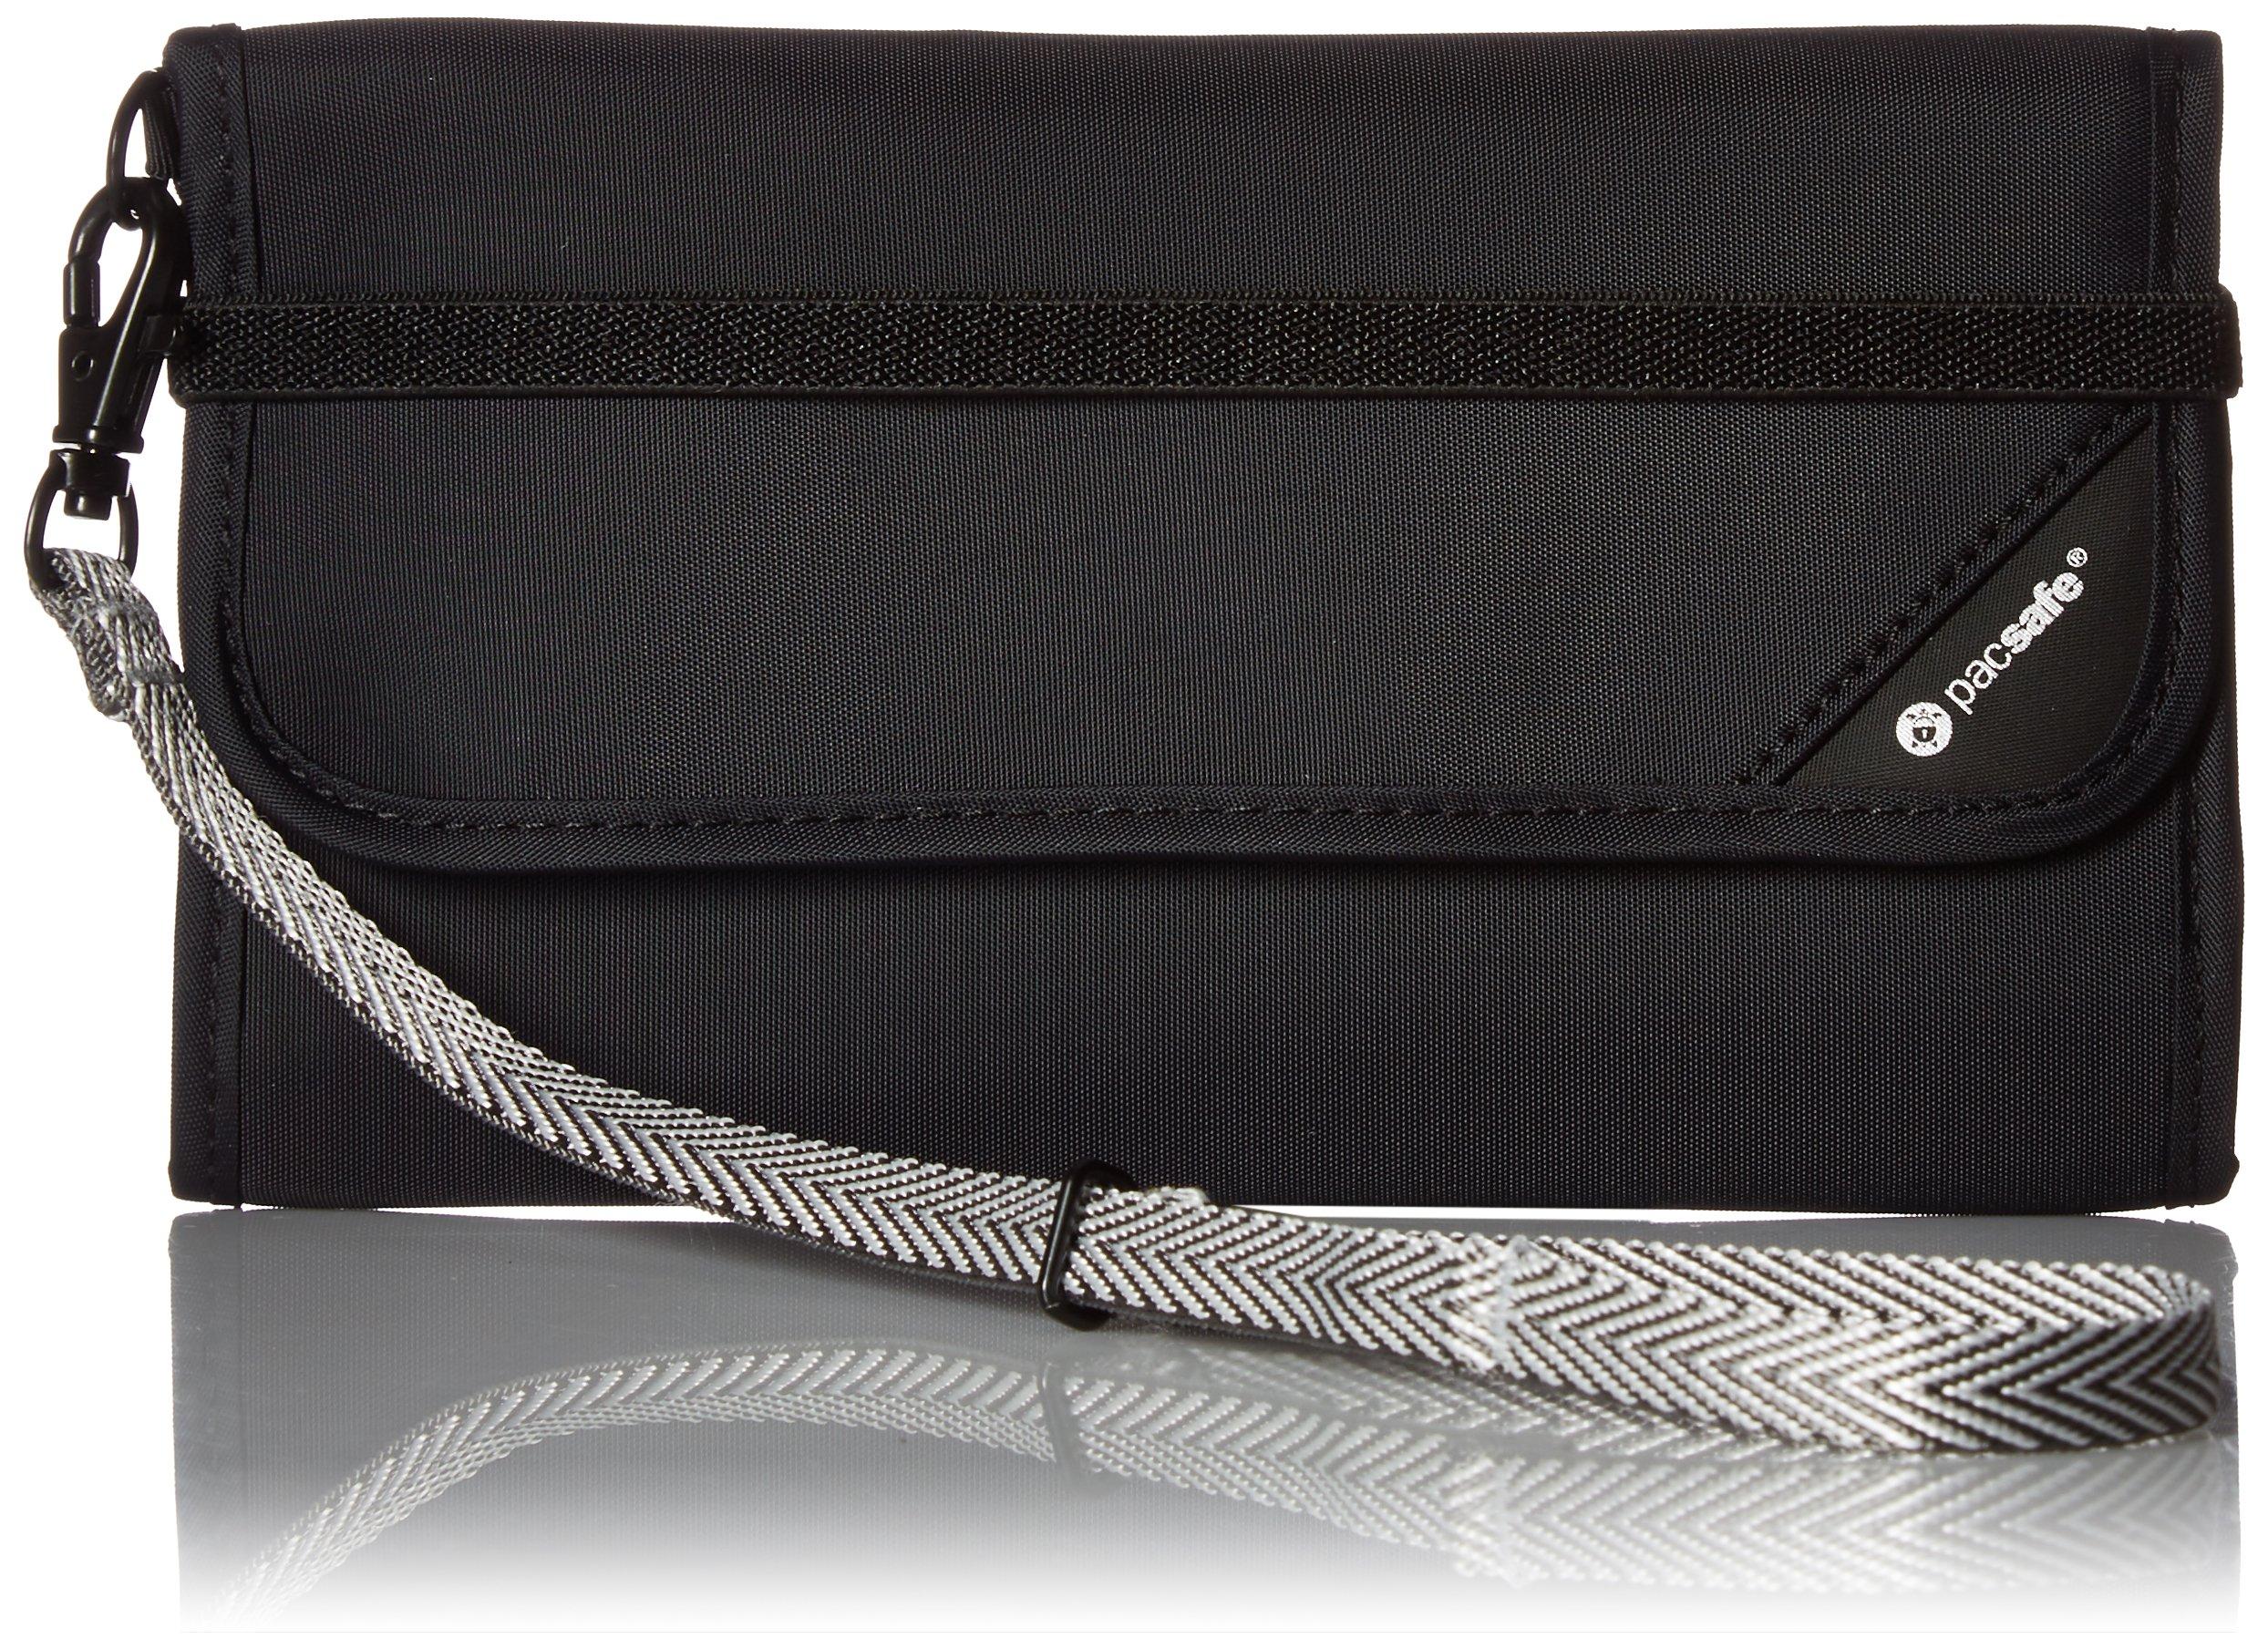 PacSafe RFIDsafe V250 Anti-Theft RFID Blocking Travel Wallet, Black by Pacsafe